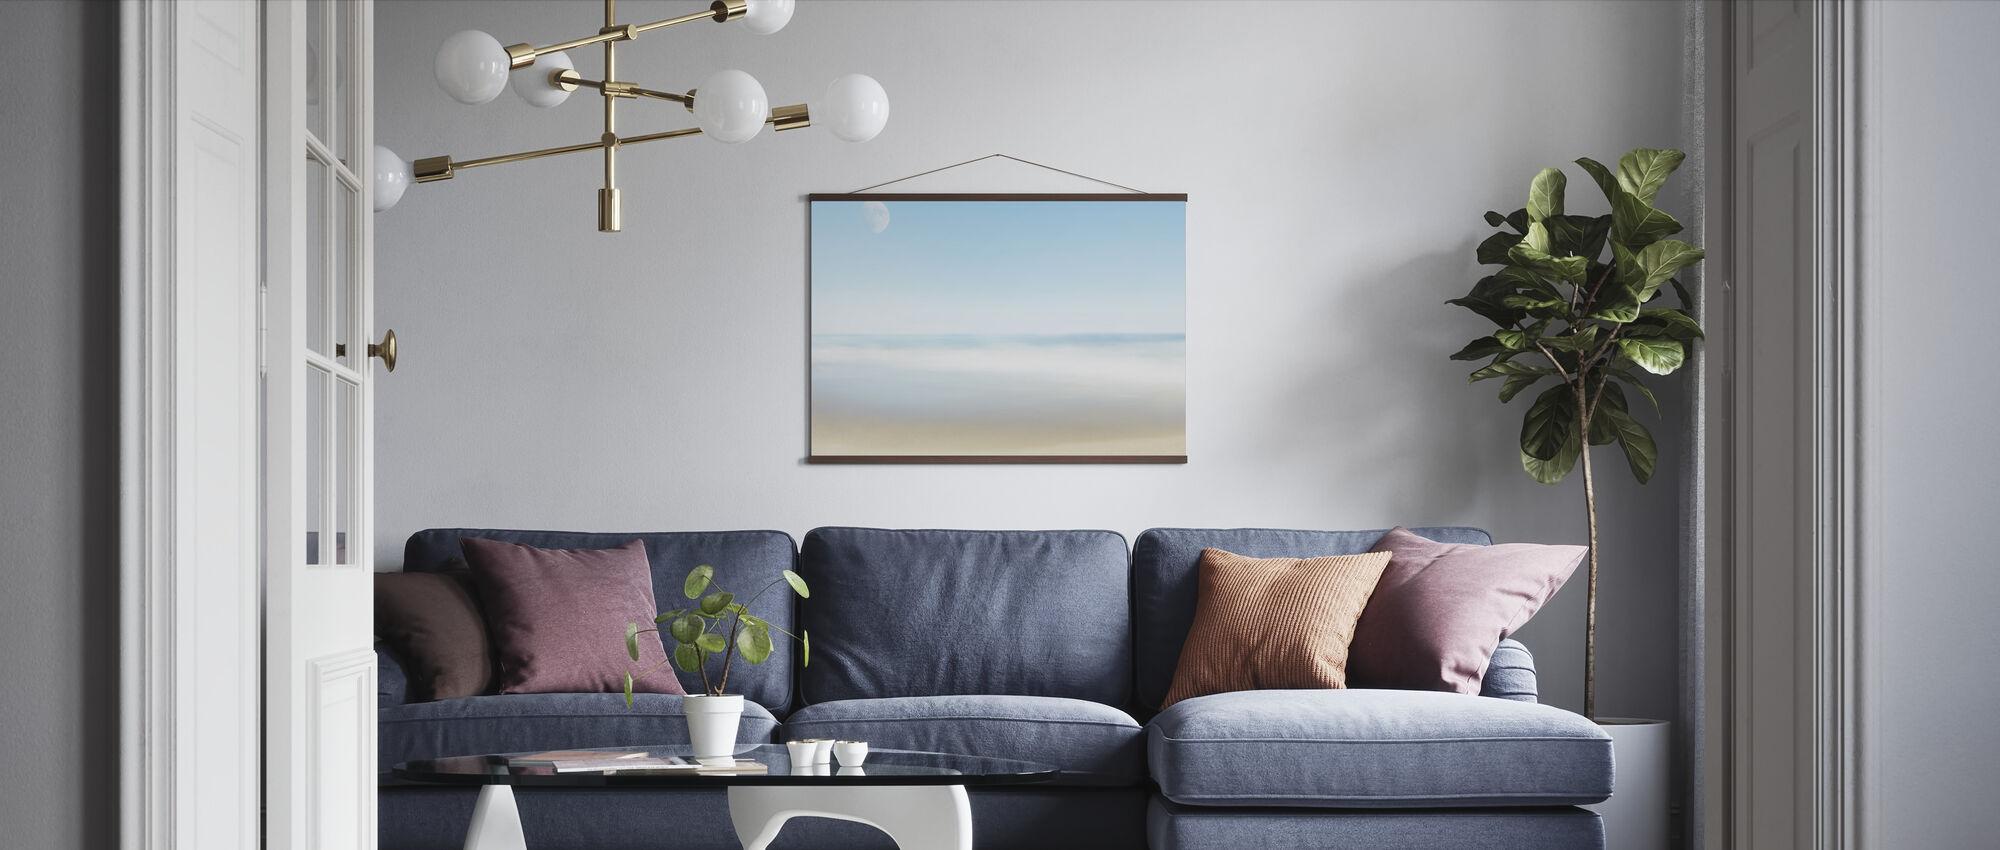 Beachscape kuva II - Juliste - Olohuone